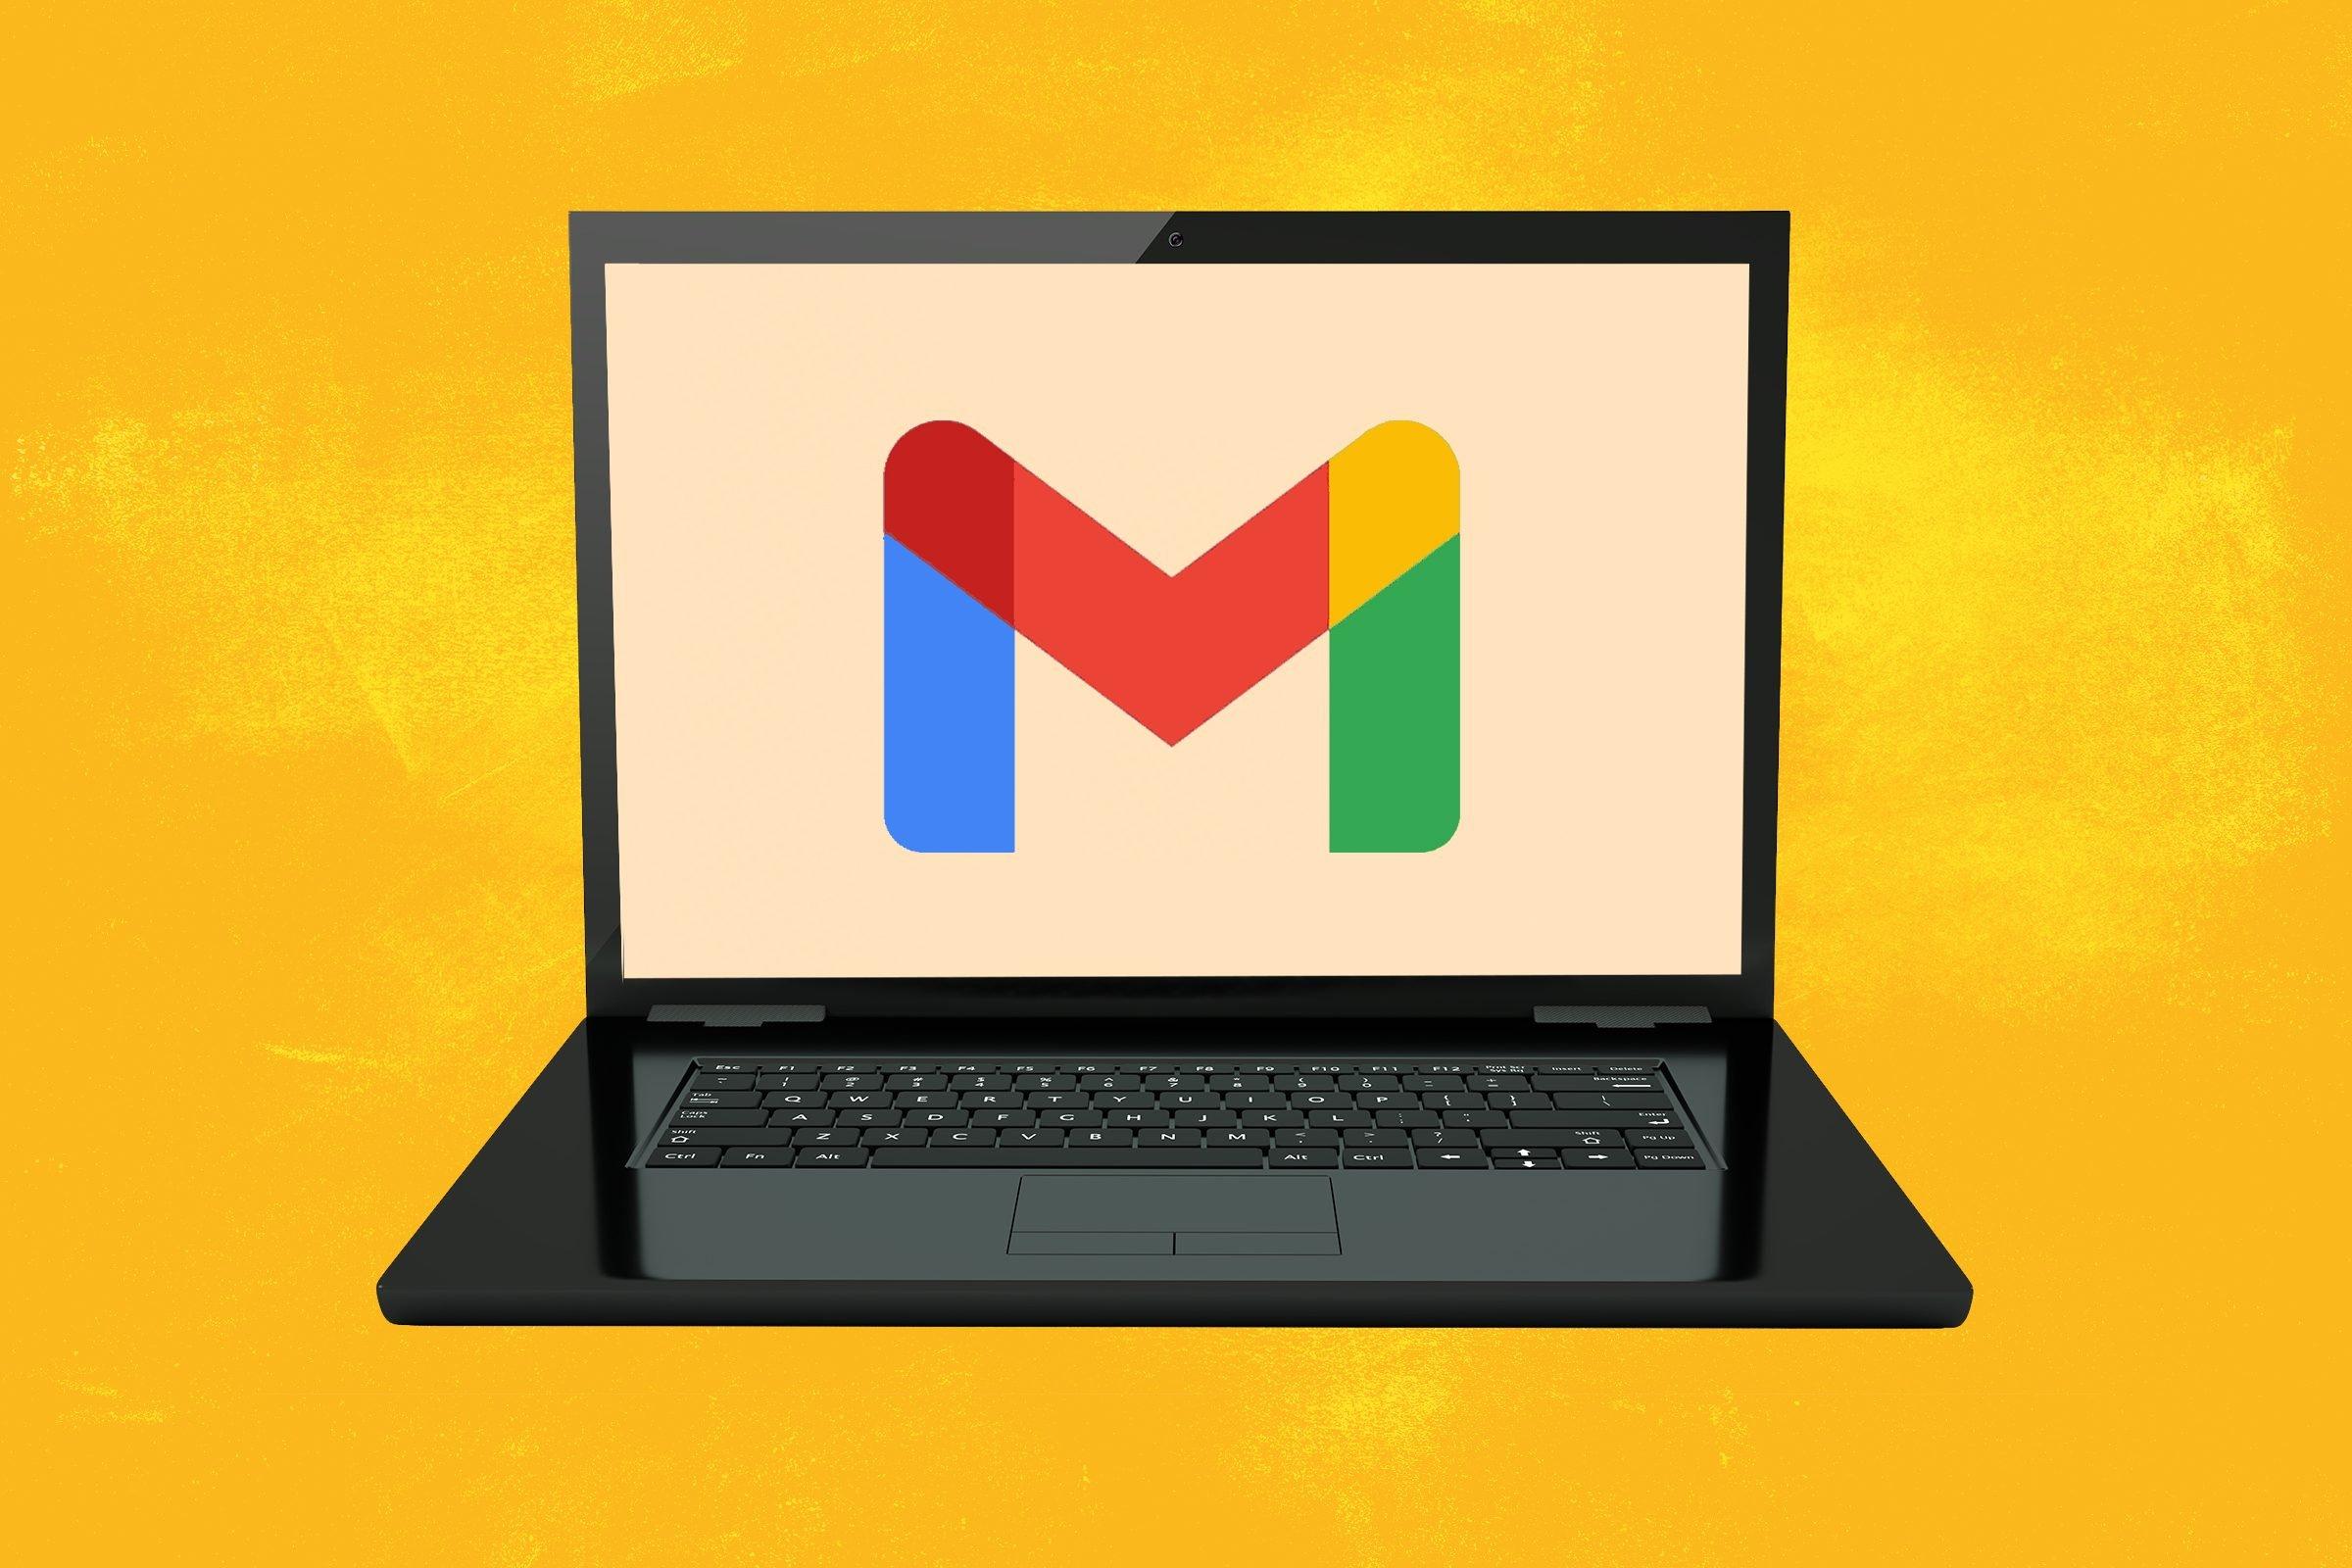 Windows computer screen showing Gmail logo